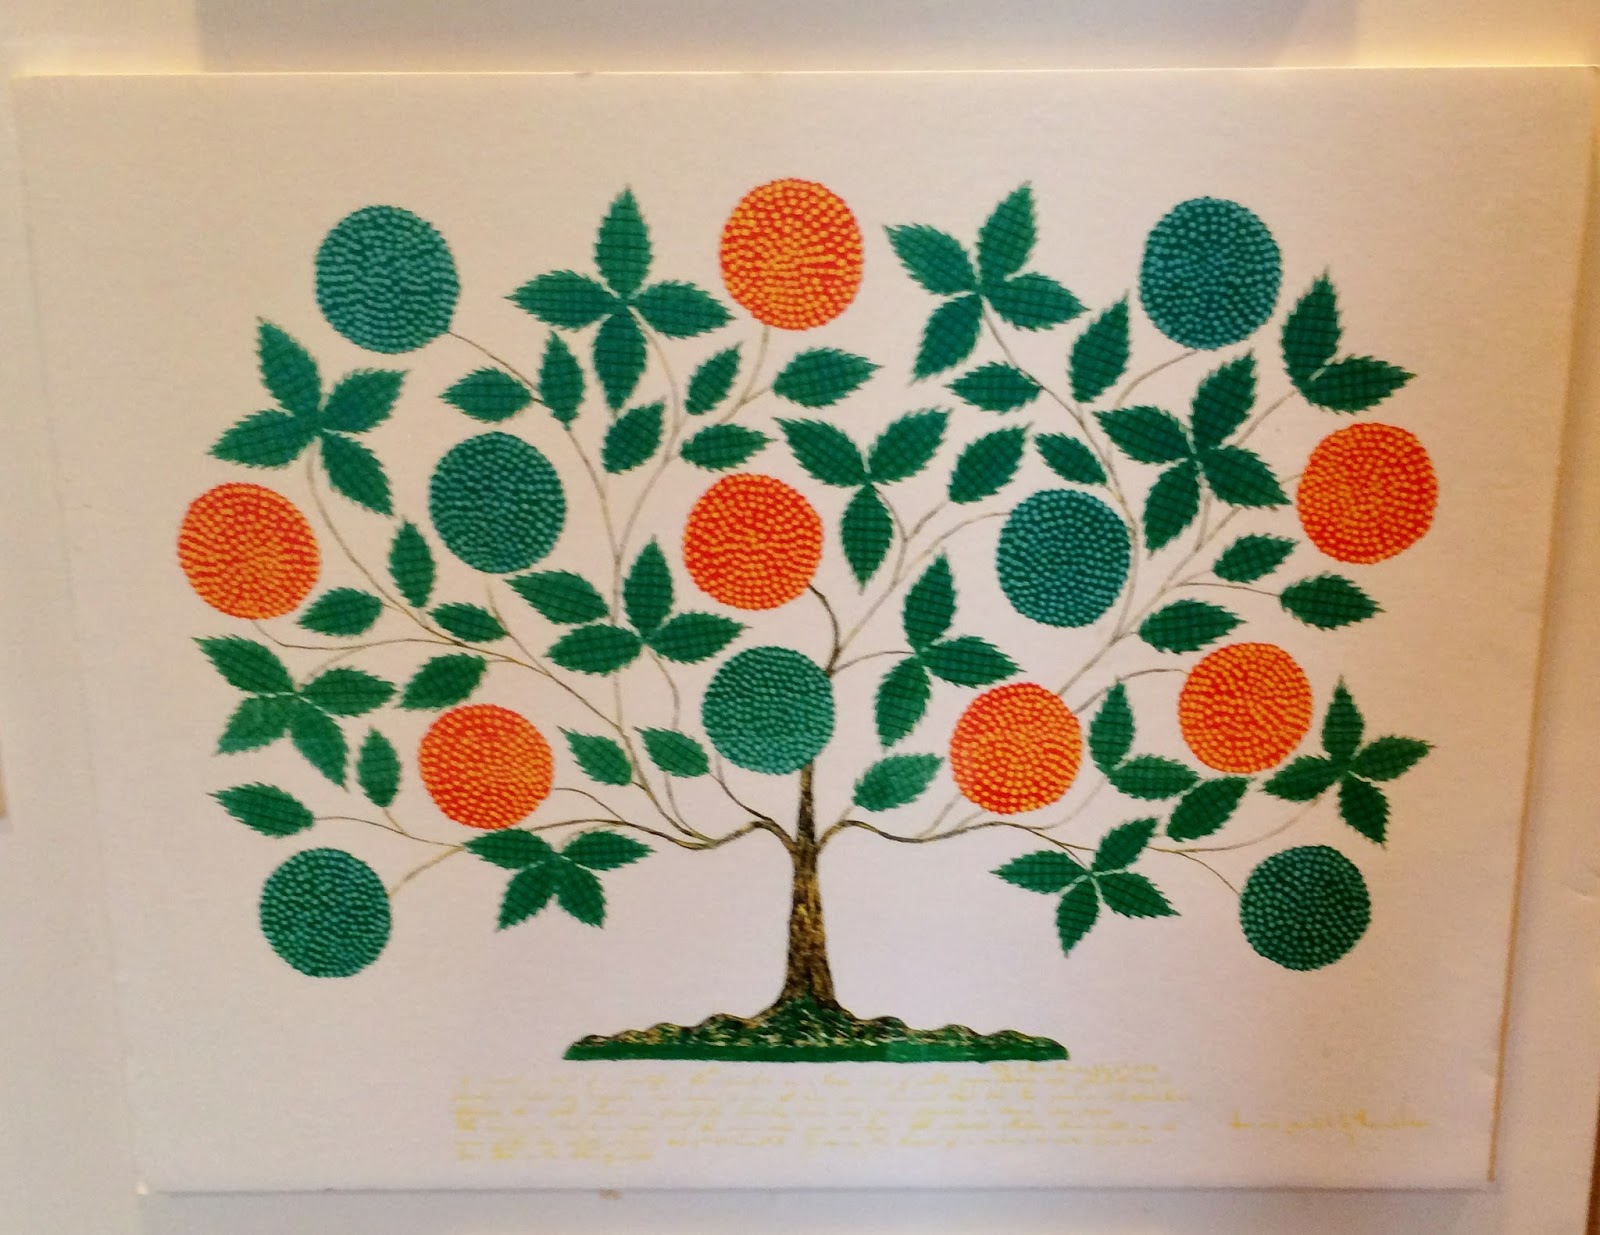 tree-of-life-painting-shaker